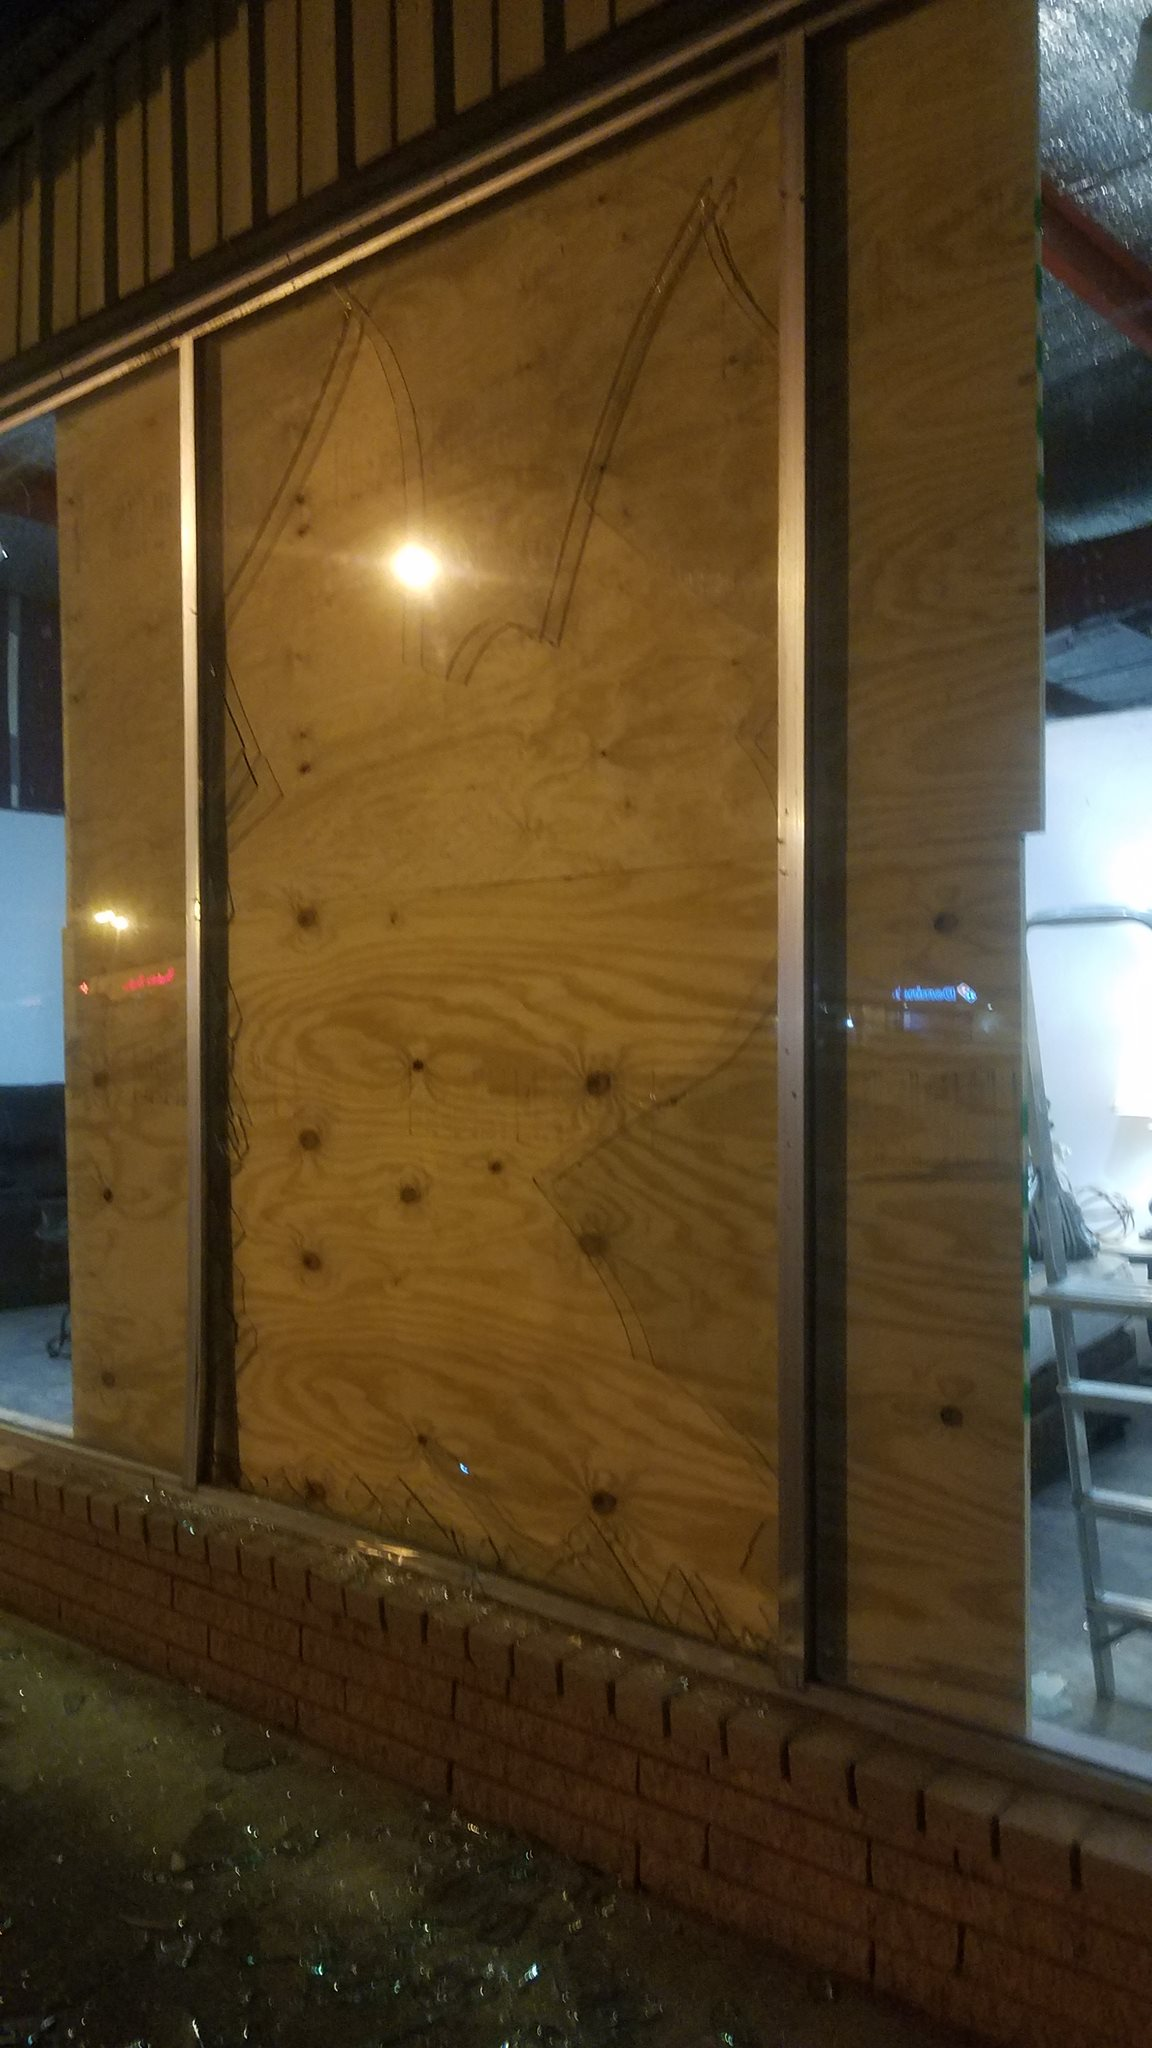 Lpd Liberty Furniture Store Damaged By Errant Driver Bluebonnet News